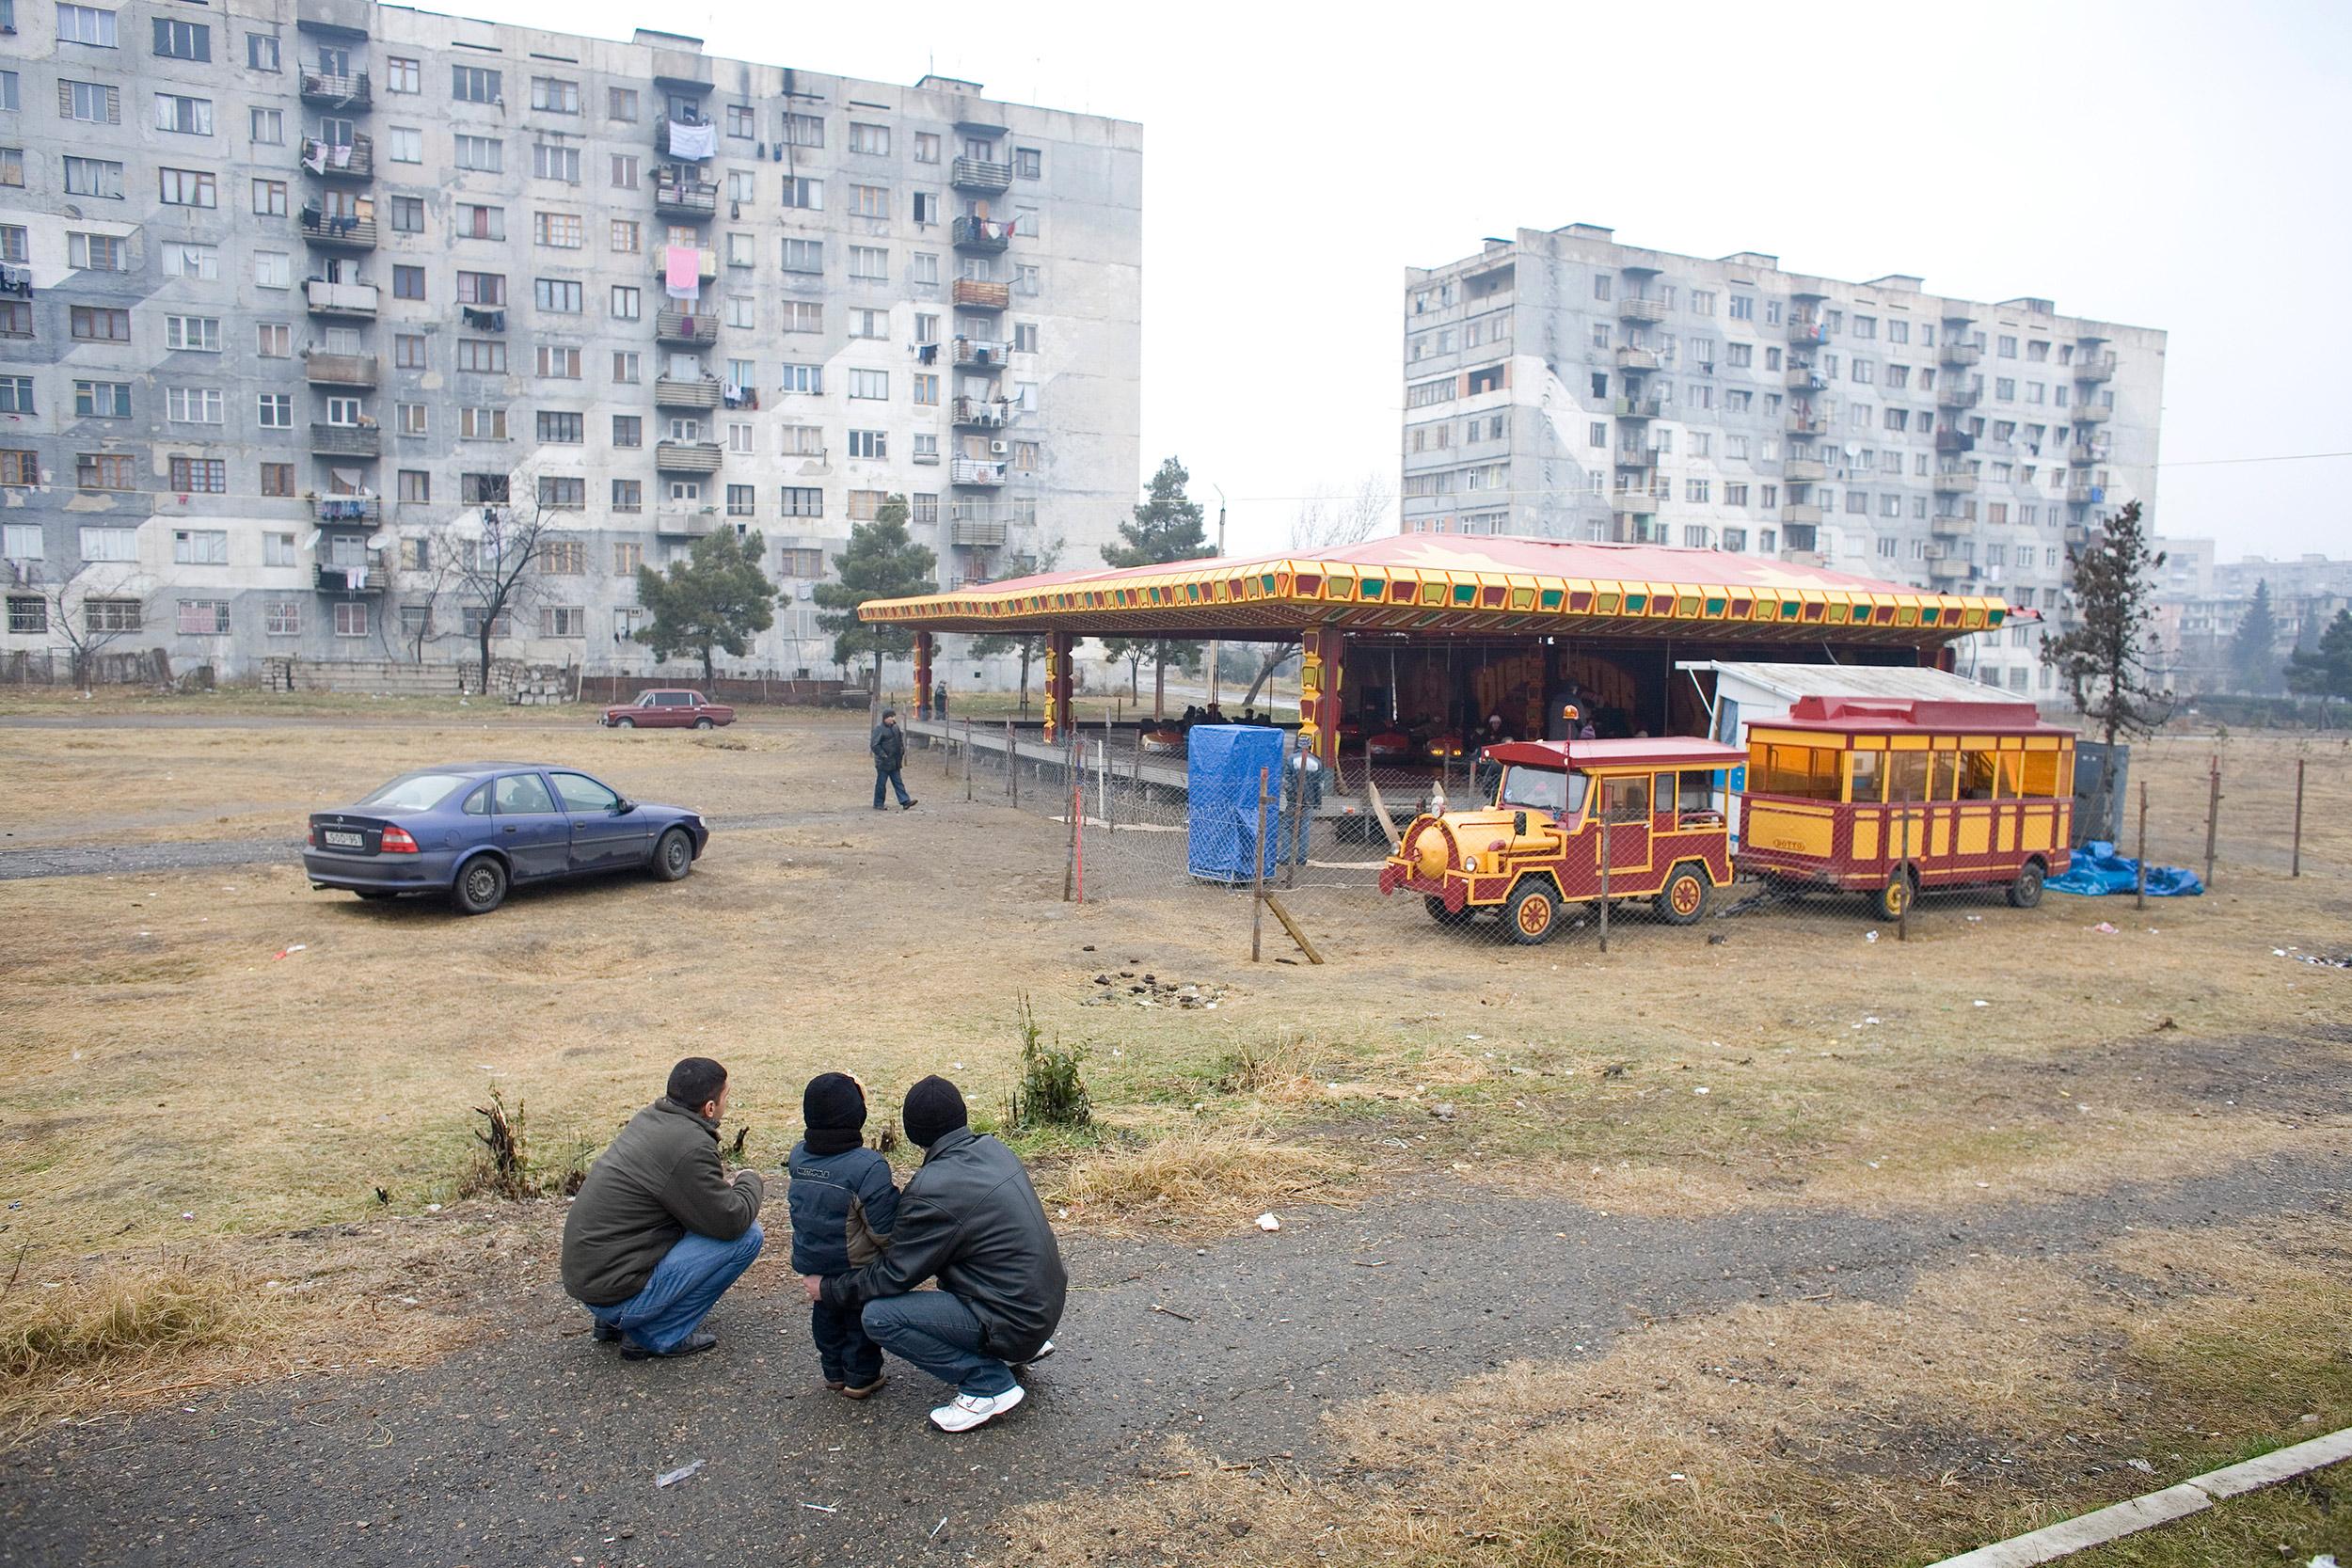 Georgia, Rustavi, January 2007